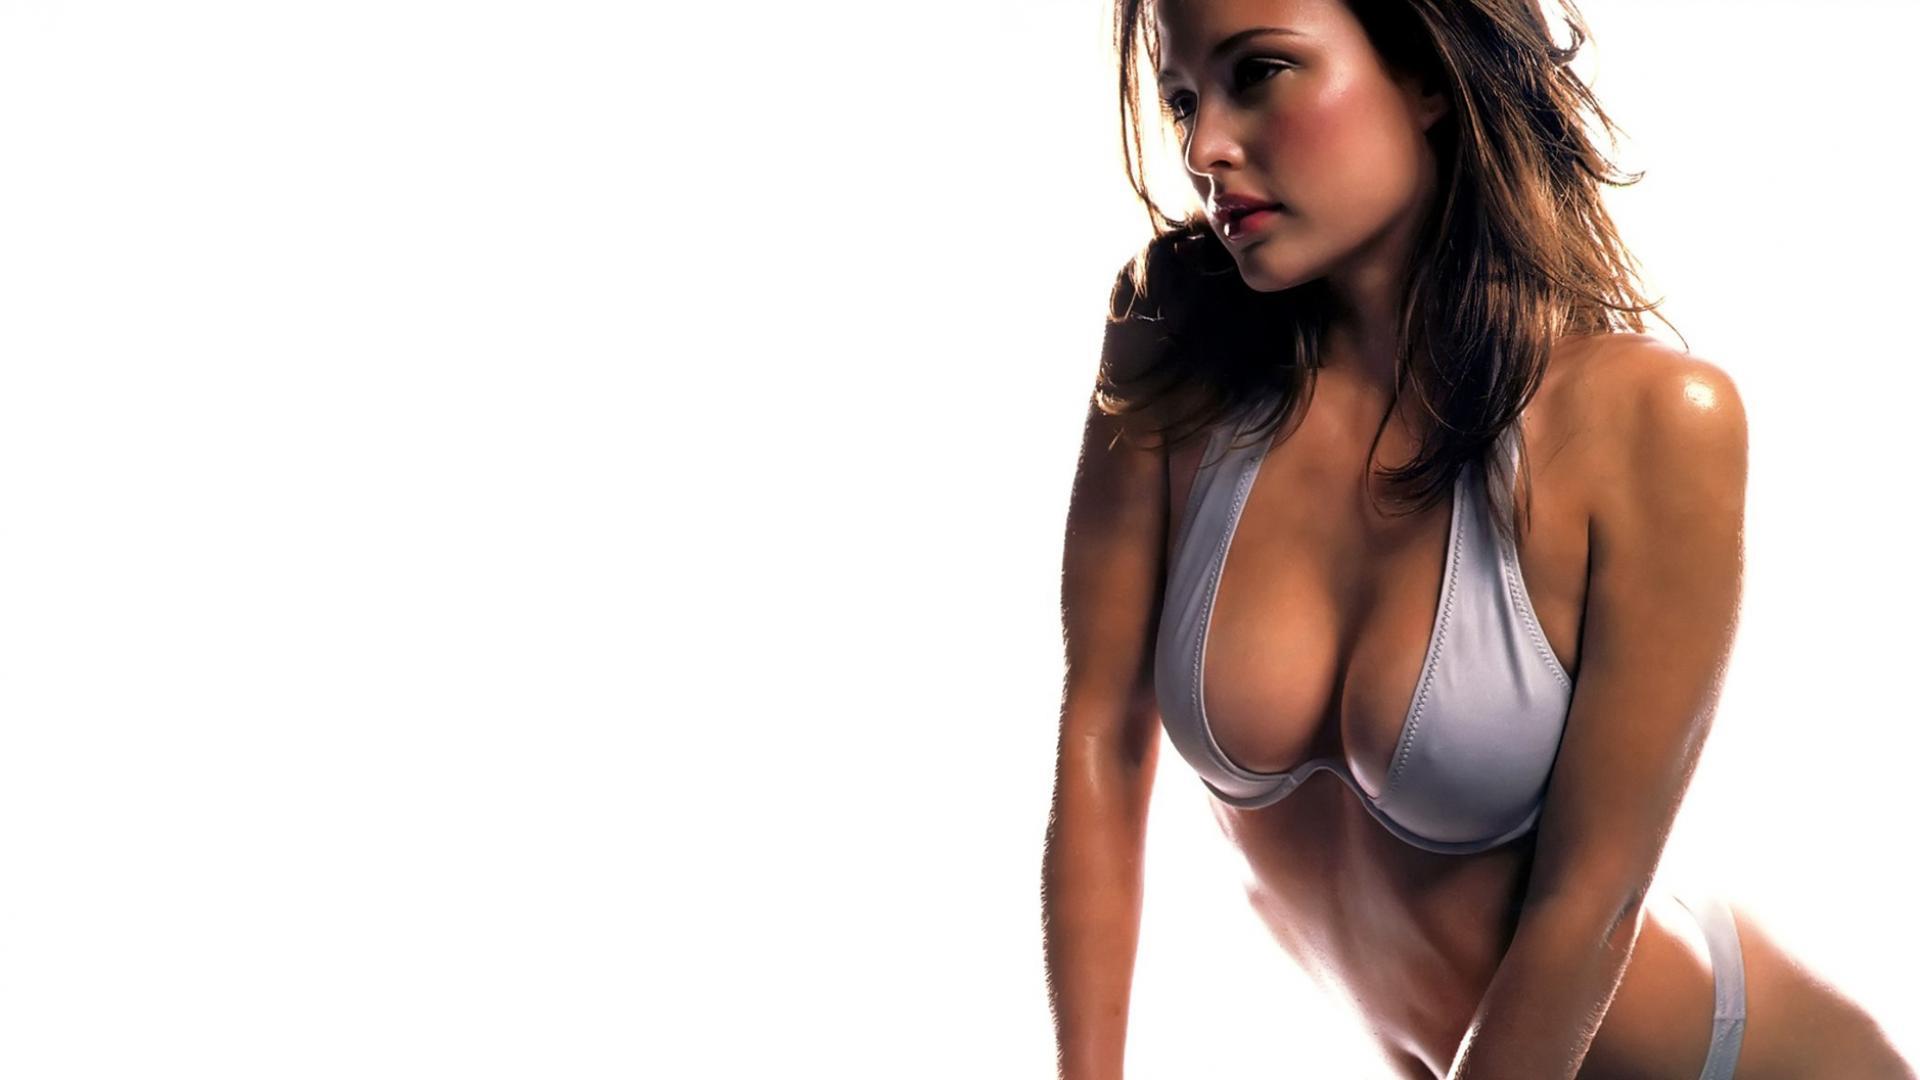 Фото голых девушек джози модел josie model 20 фотография